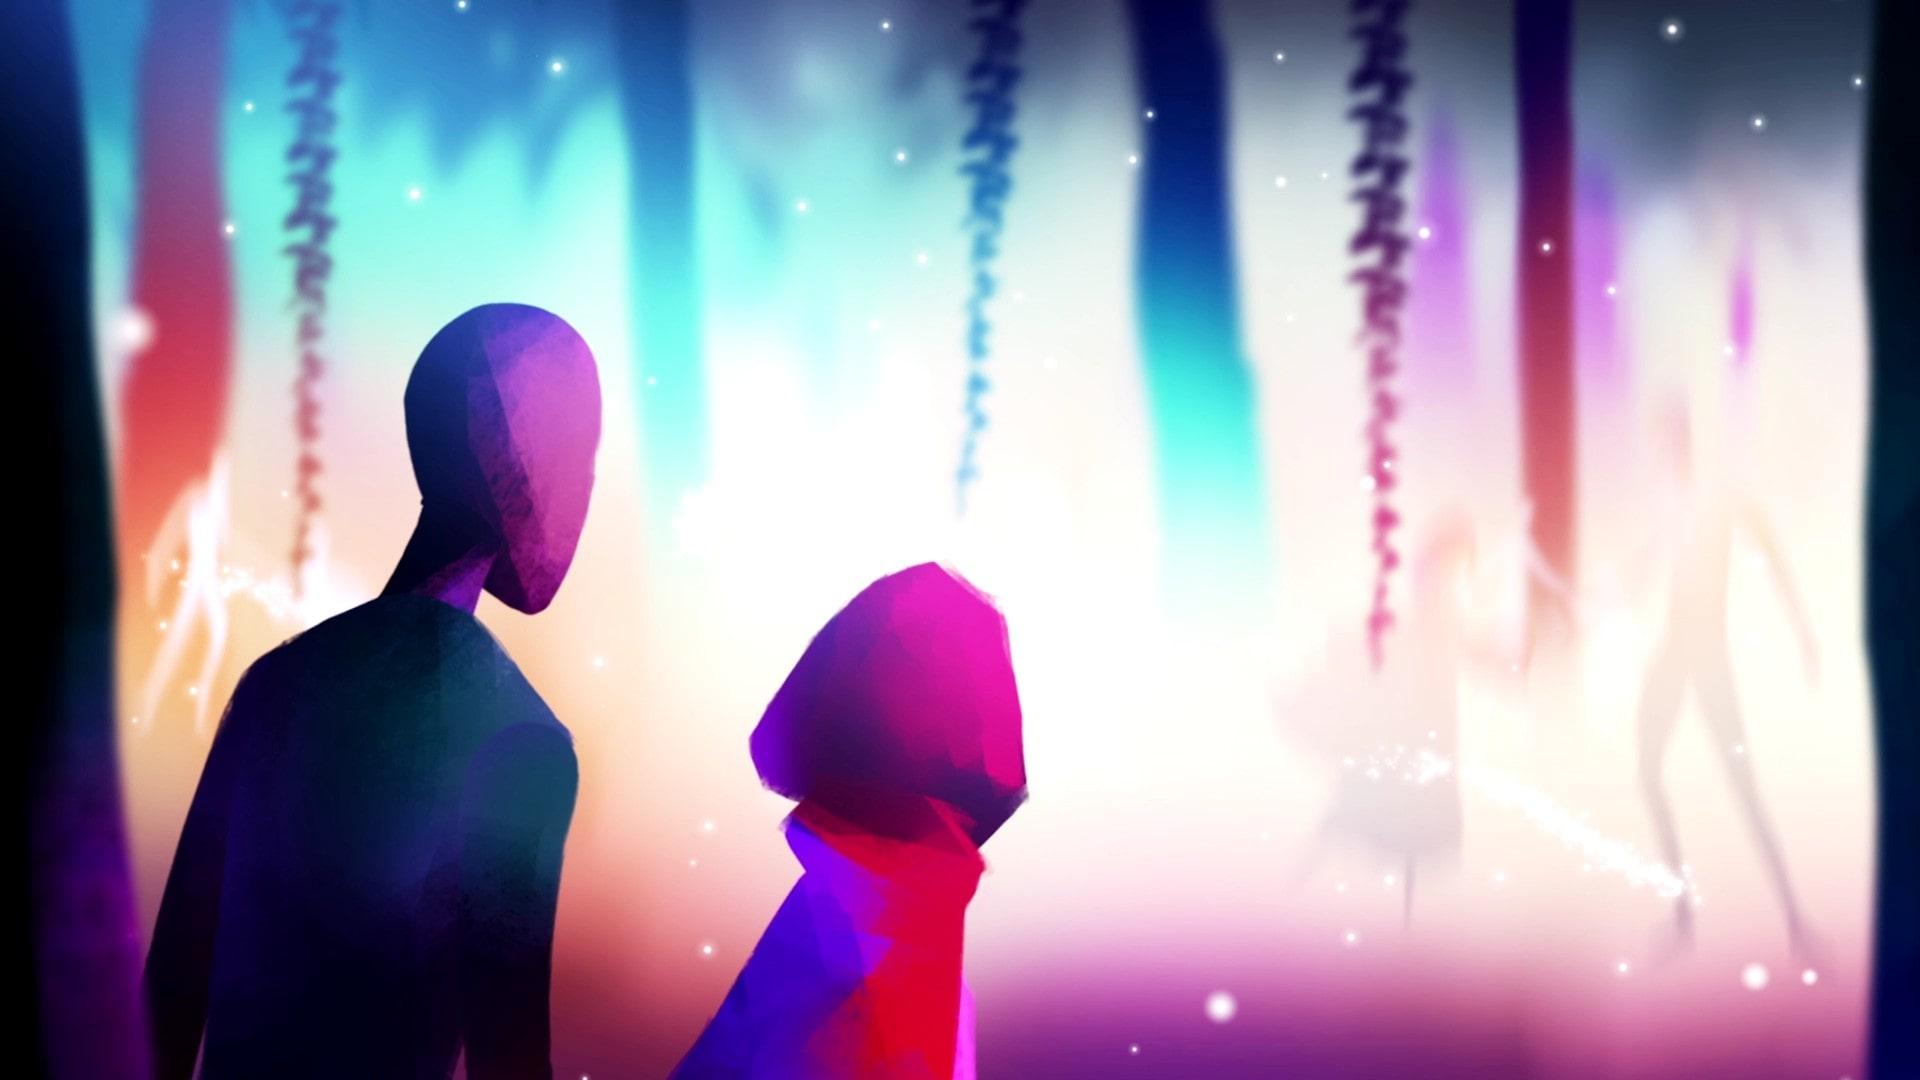 tee noah - indigo music video